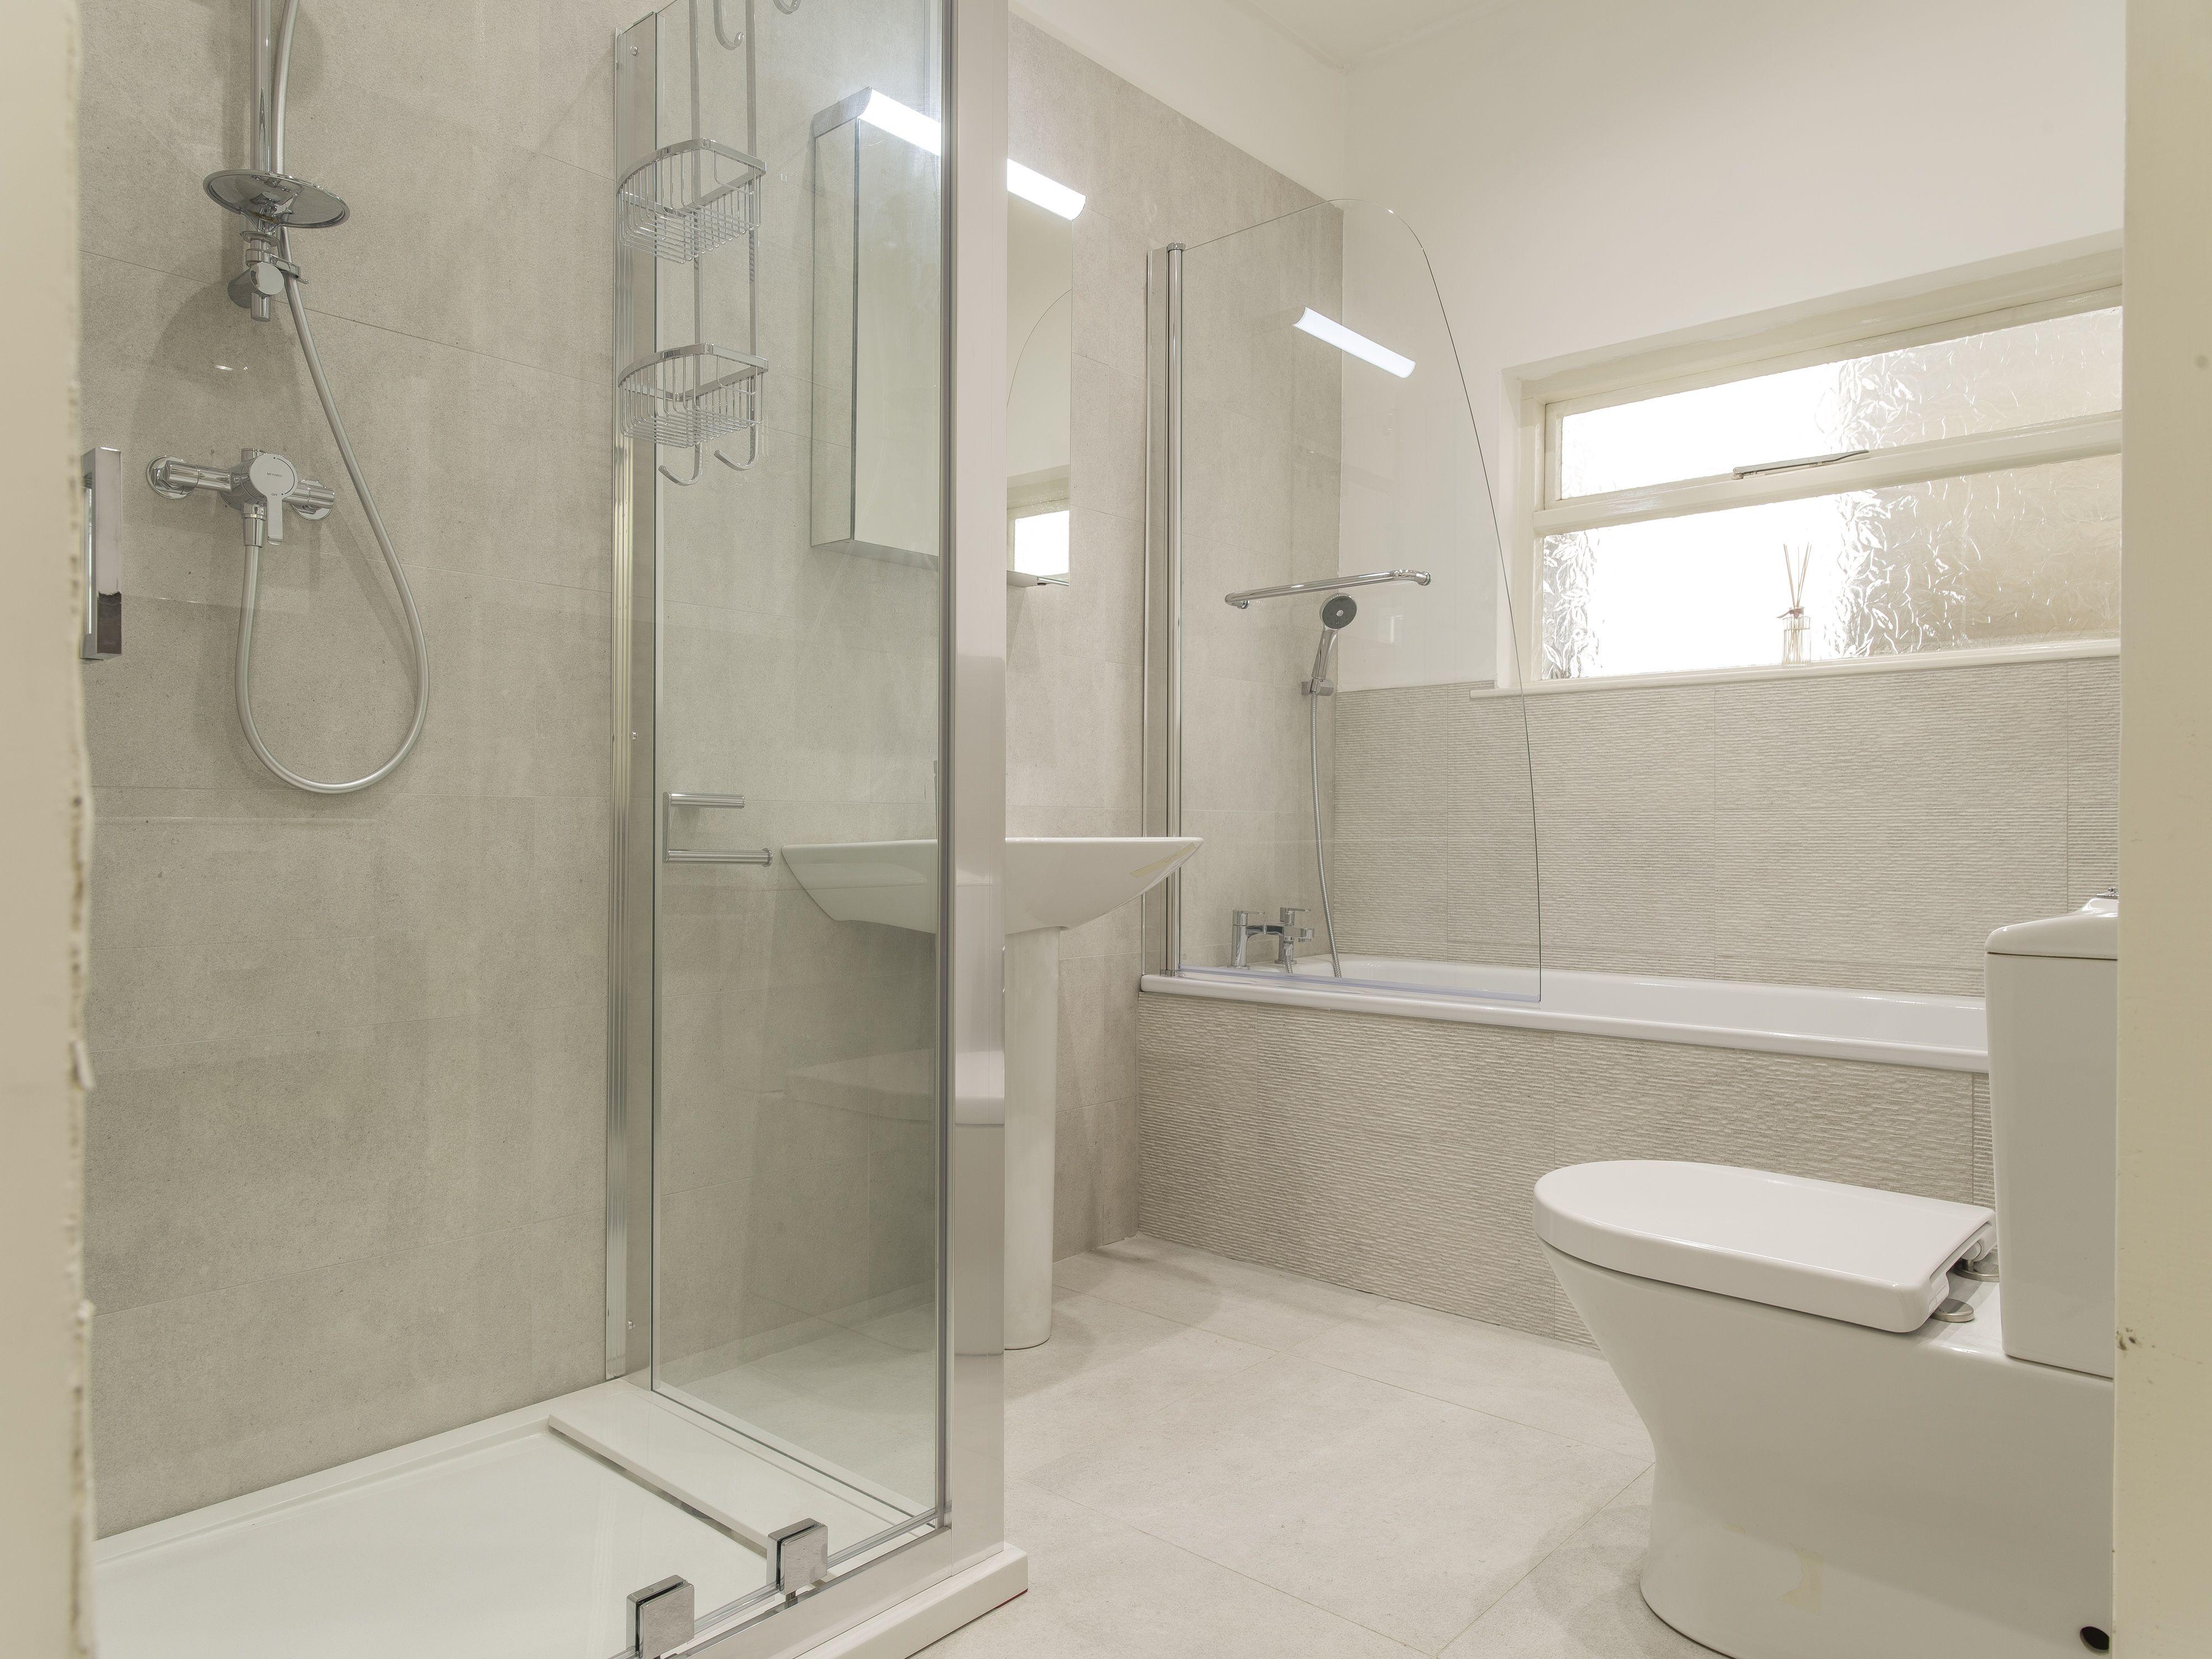 Buildbase Bathroom Showrooms Traditional Bathroom Suites Traditional Bathroom Modern Bathroom Design